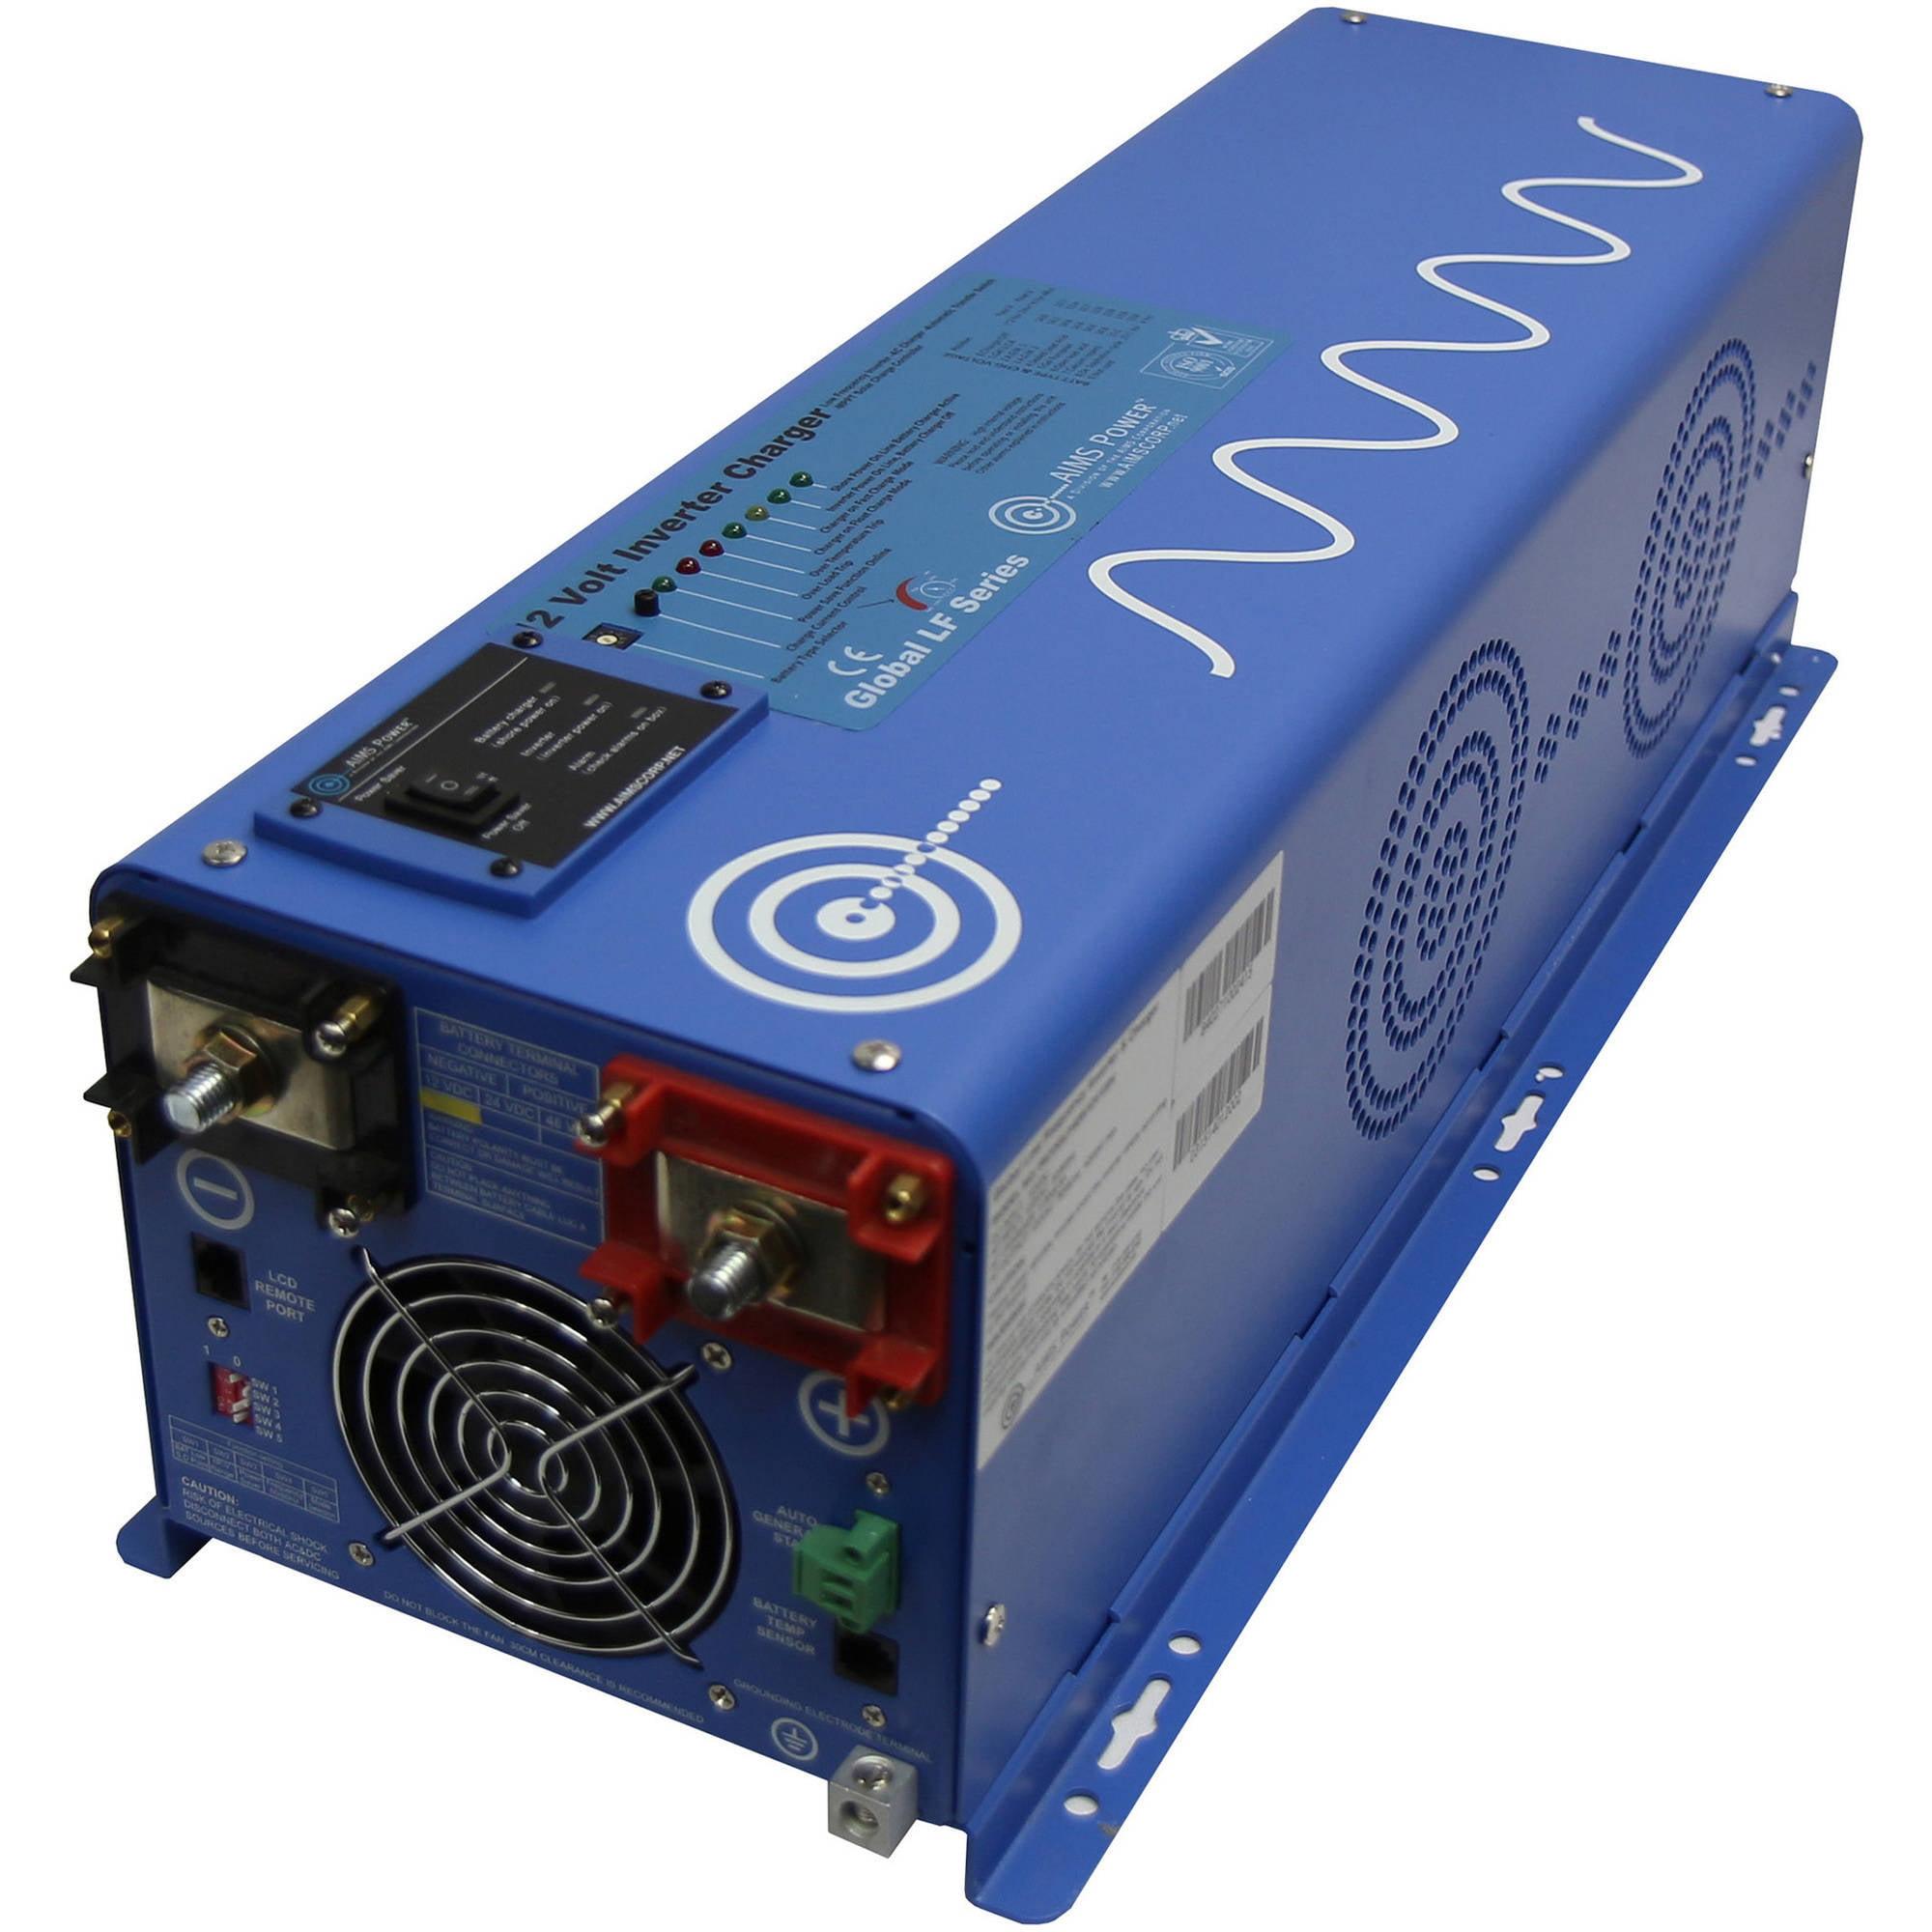 24fe3b6a aeea 45ab 98fa 61472f60d21a_1.5bb912c84a8d35f6e6dfd56ff0110a1b aims power 1500 watt 12v pure sine inverter walmart com  at reclaimingppi.co